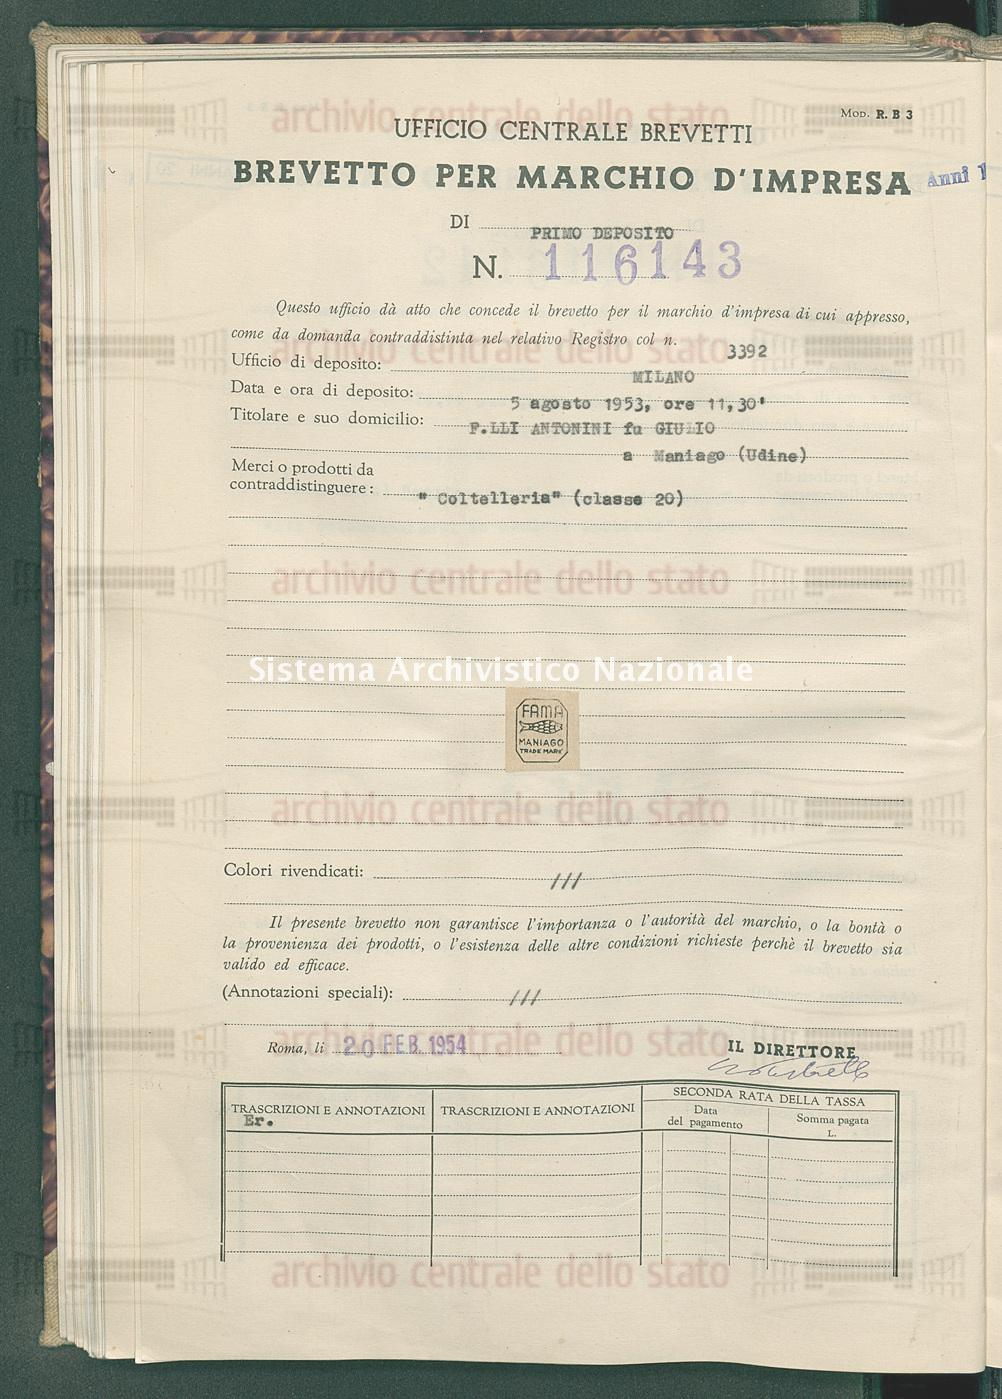 'Coltellerie' F.Lli Antonini Fu Giulio (20/02/1954)